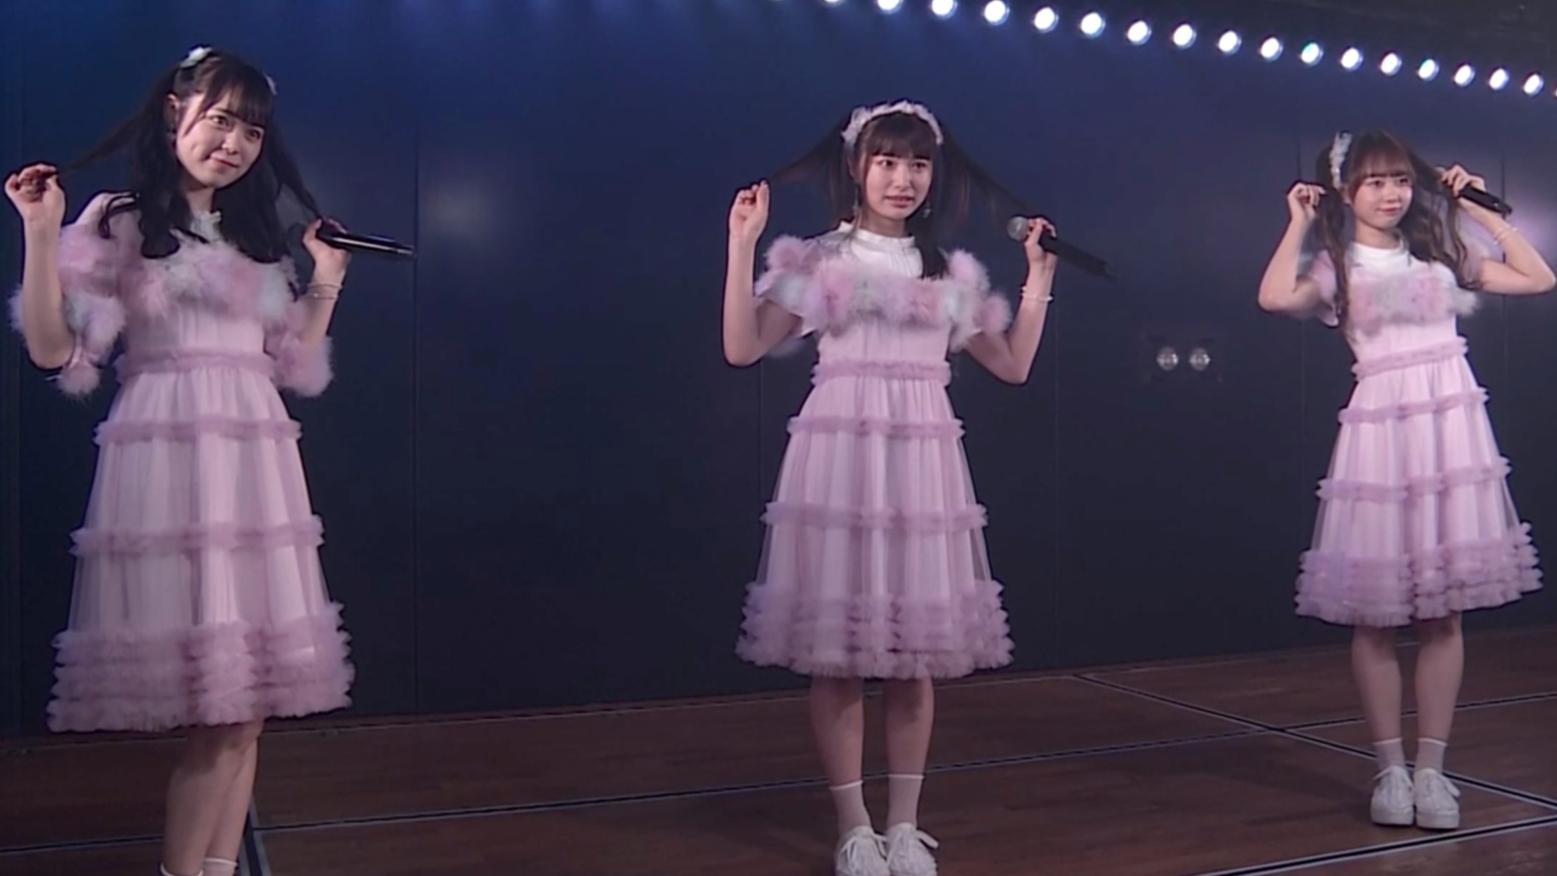 【AKB48】200704 配信限定公演 最萌身高差公演 三宝公演